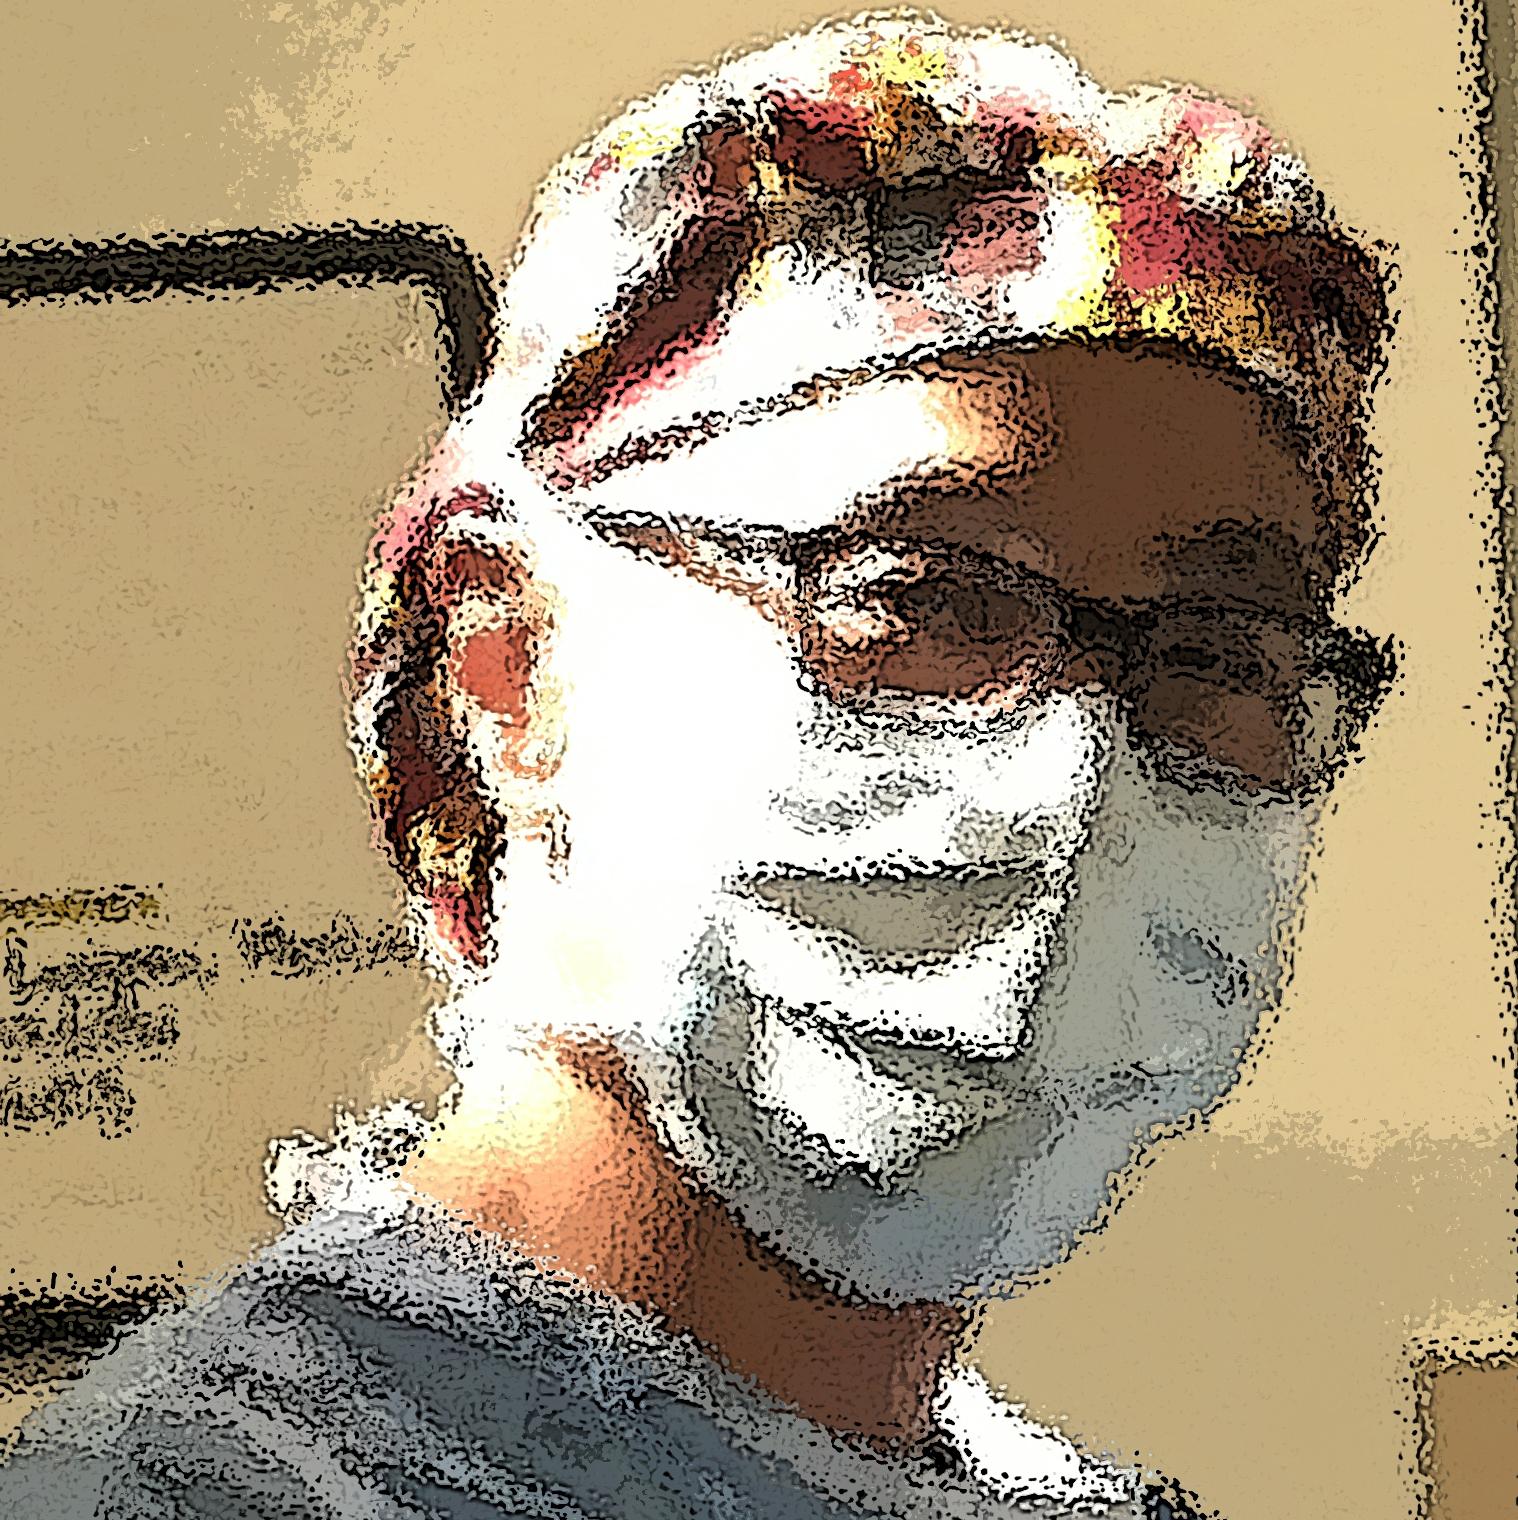 Neuro-endoscopy